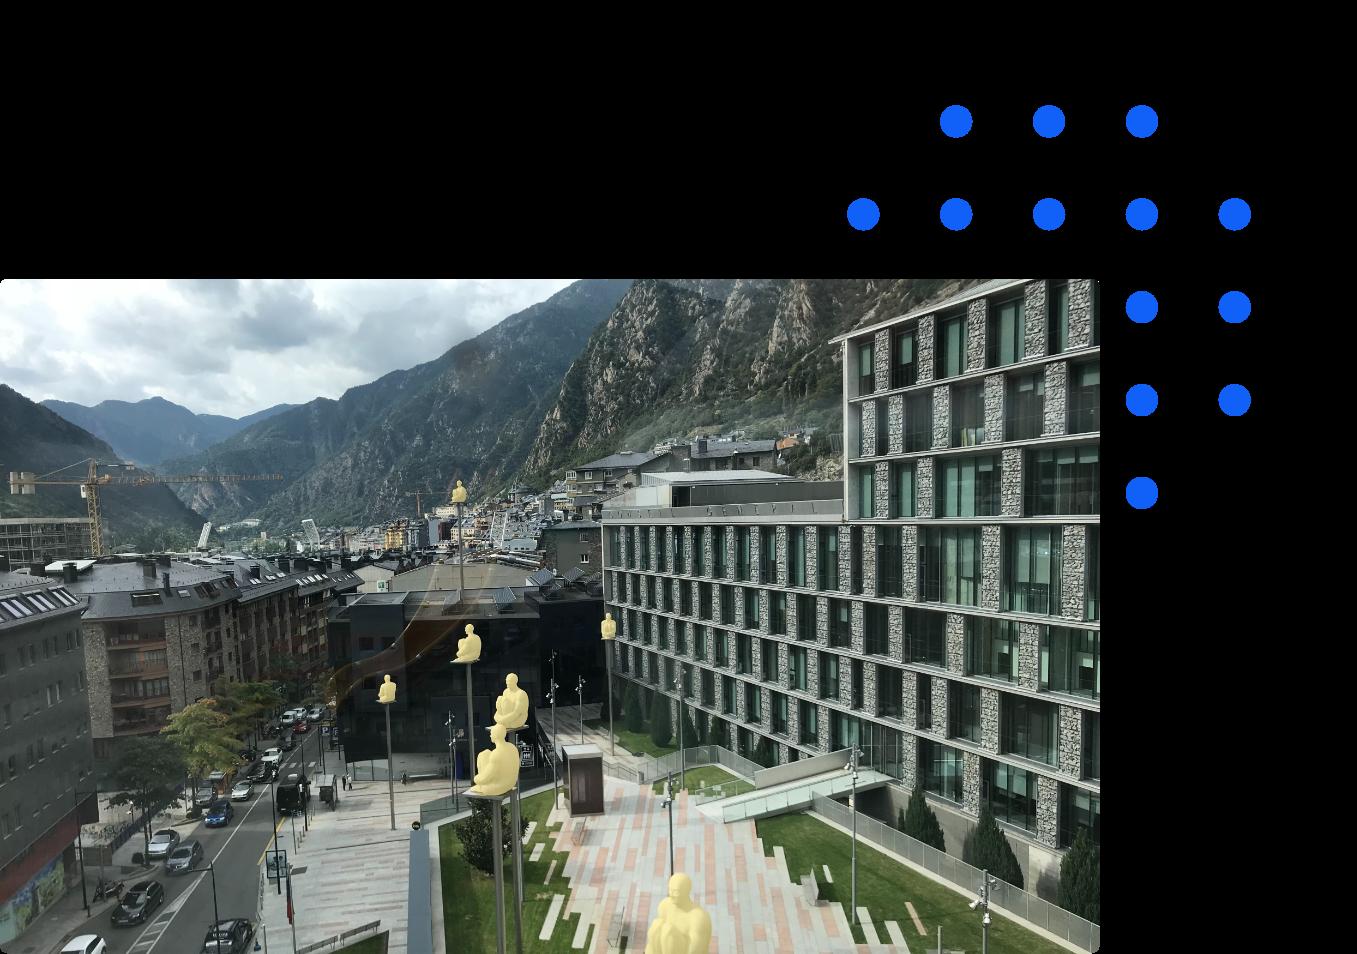 Group Andorra city